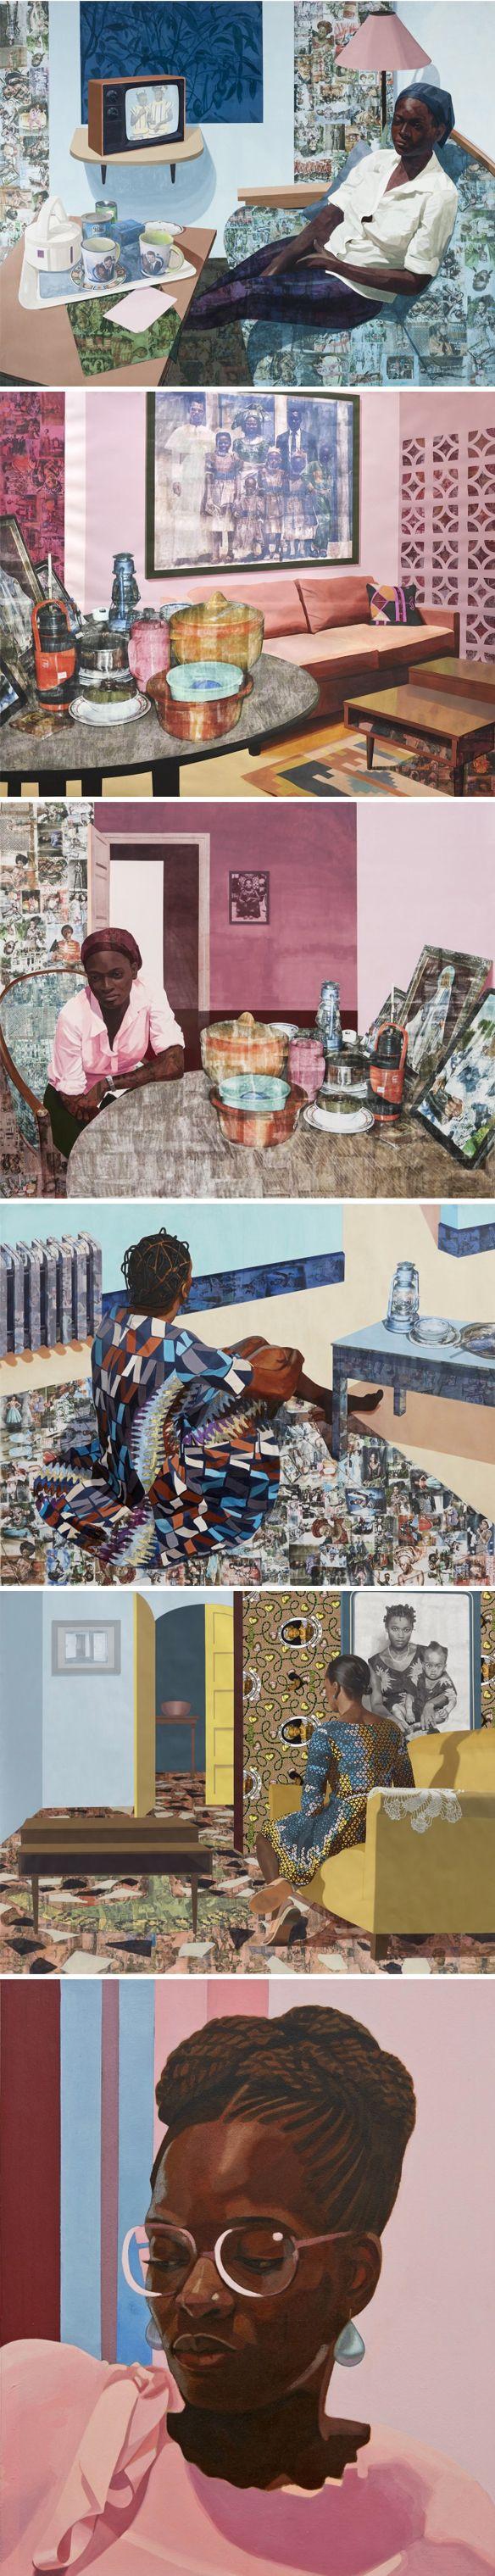 Njideka Akunyili Crosby | The Jealous Curator